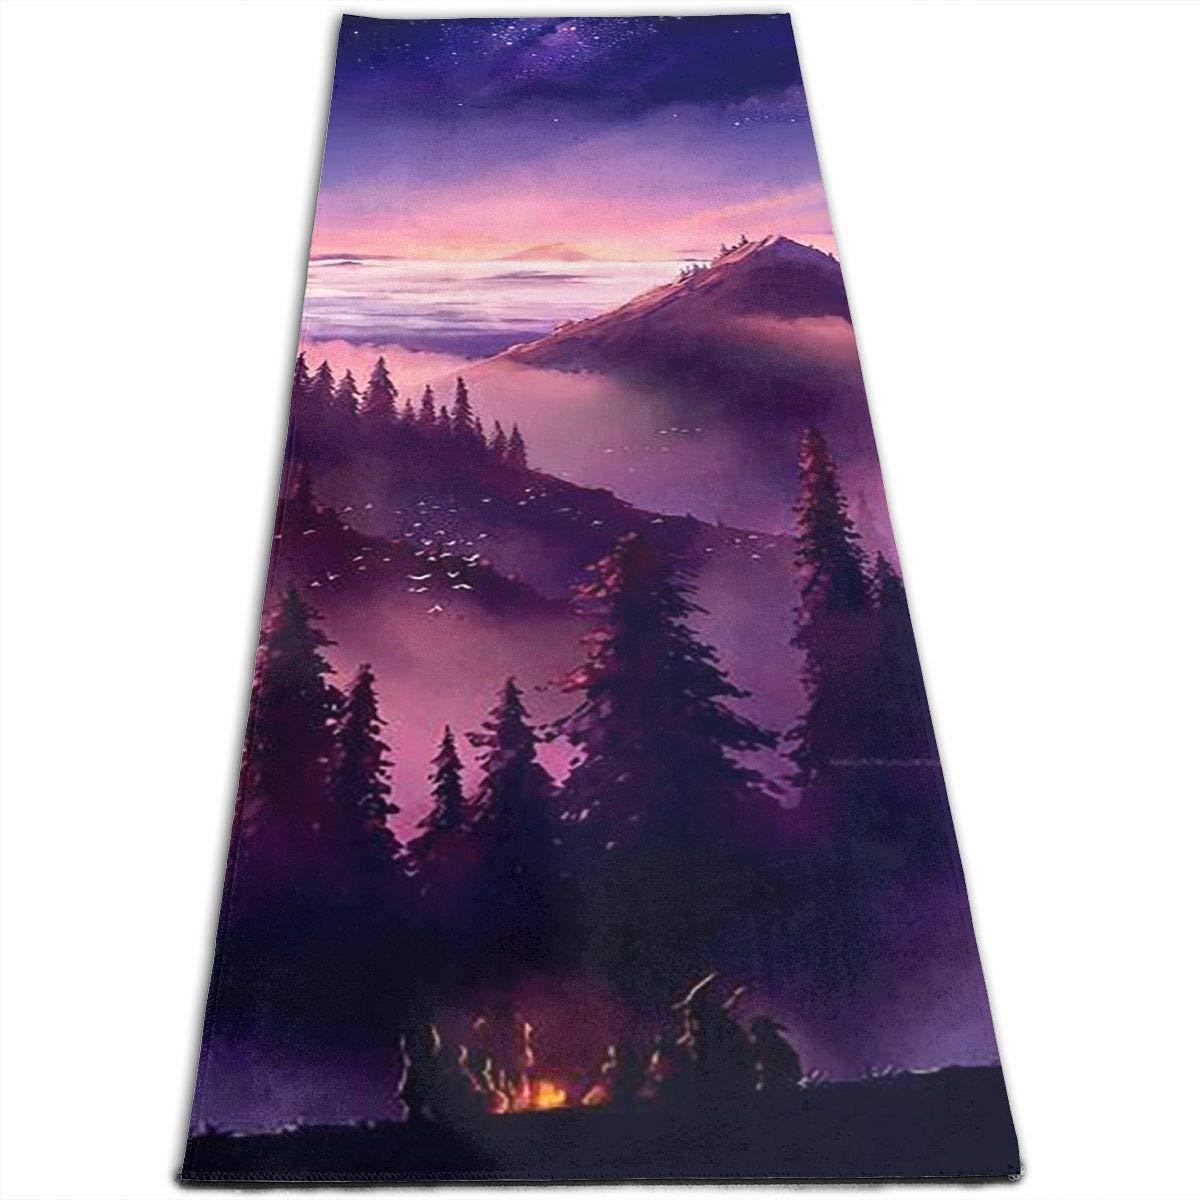 Bonfire Mountain Print Yoga Mat, NonSlip Extra Thick Fitness Mat, for Fitness, Yoga Workout, Pilates & Floor Exercises Mat